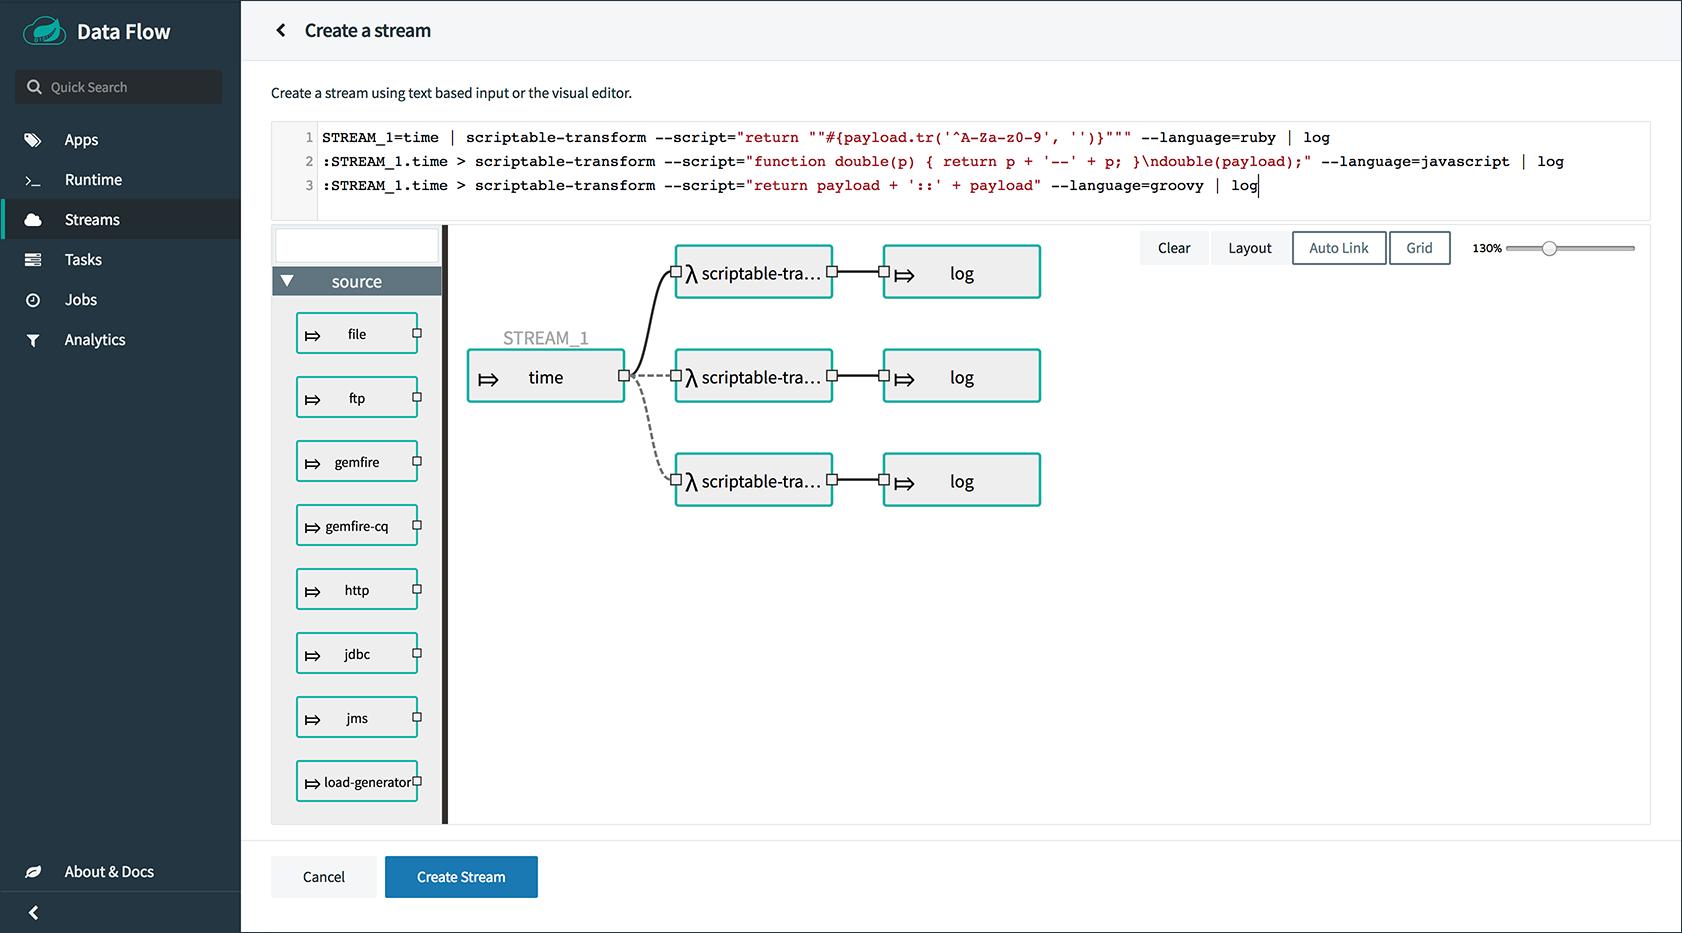 Spring Cloud Data Flow Server for Cloud Foundry